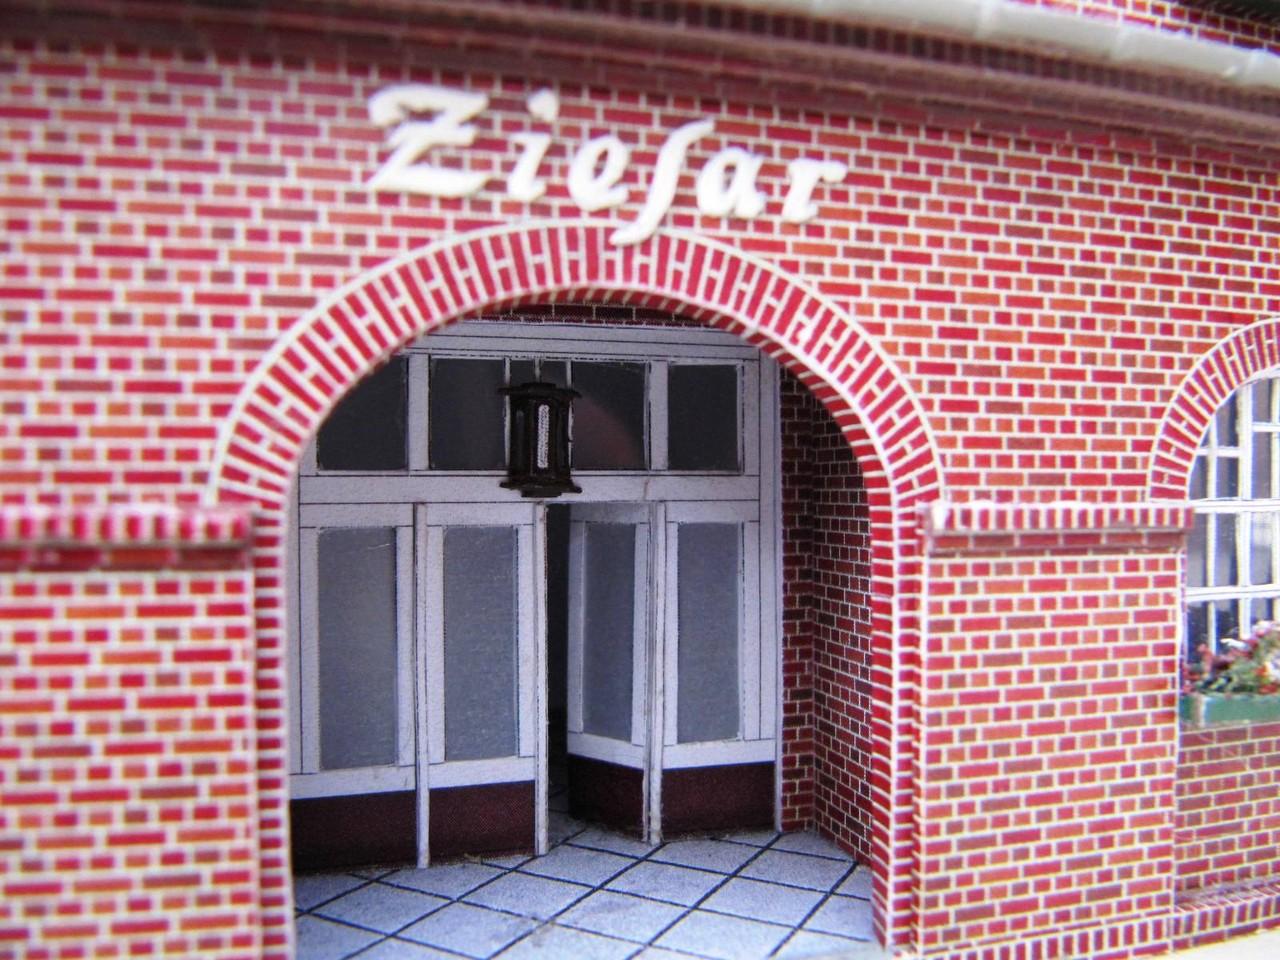 (c) W. Fehse - Eingang zum Bahnhofsgasthof Oskar Meyer 1:87 (H0)